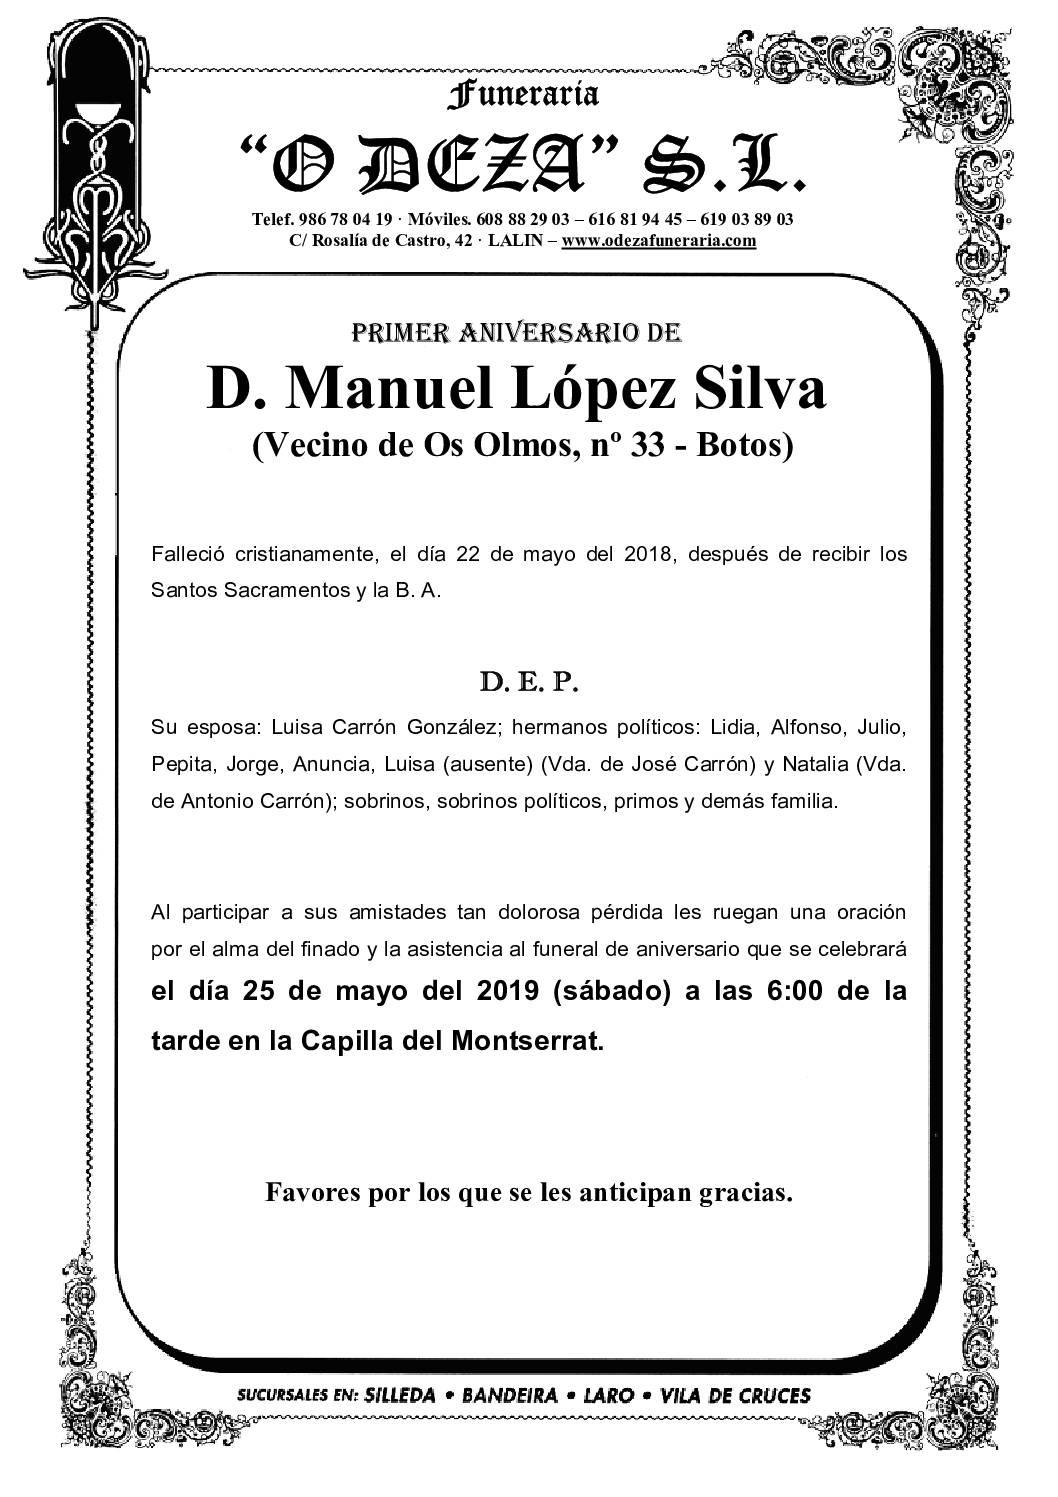 D. MANUEL LÓPEZ SILVA